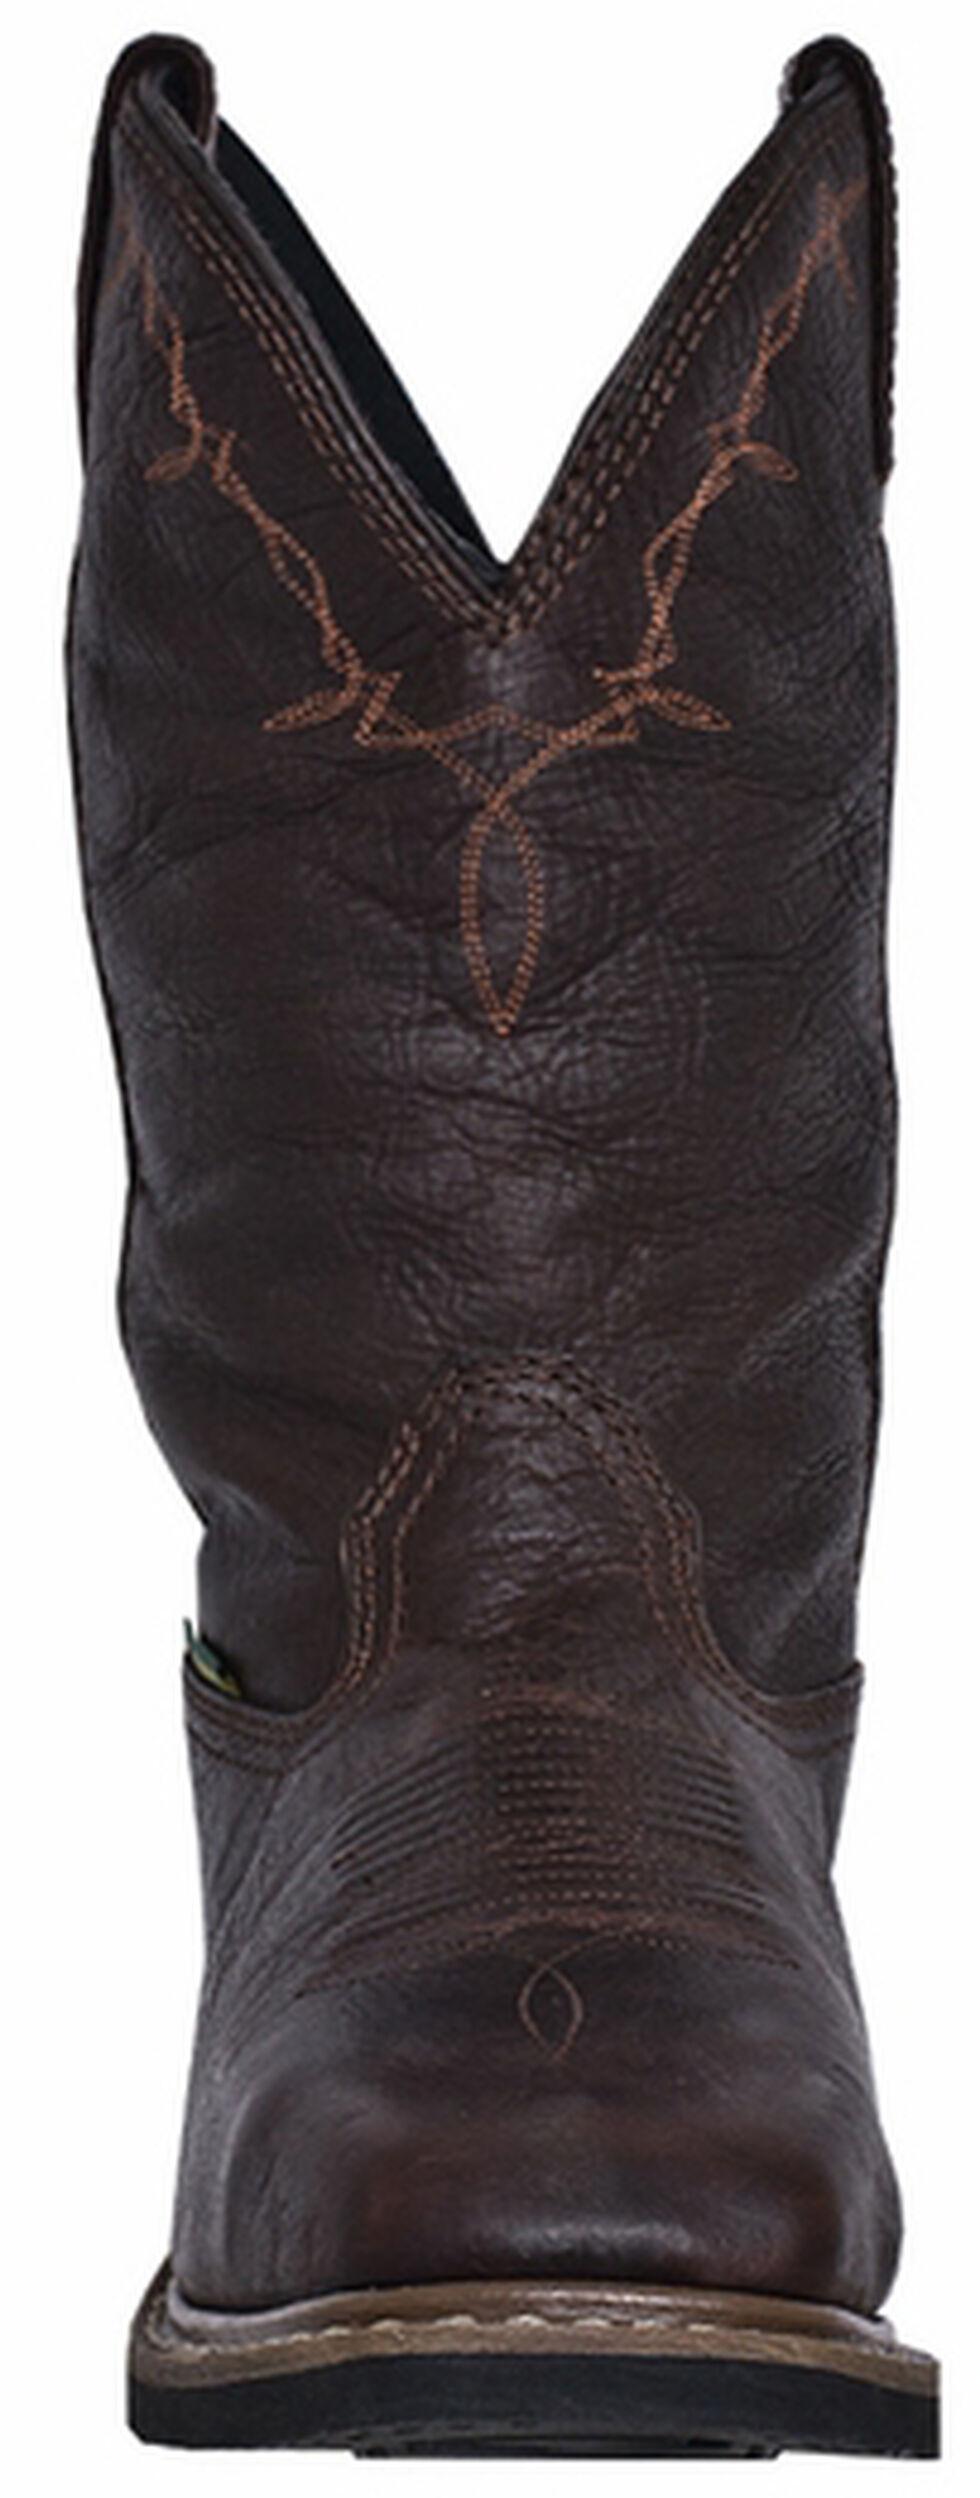 John Deere Men's Leather Western Work Boots - Steel Toe, Copper, hi-res